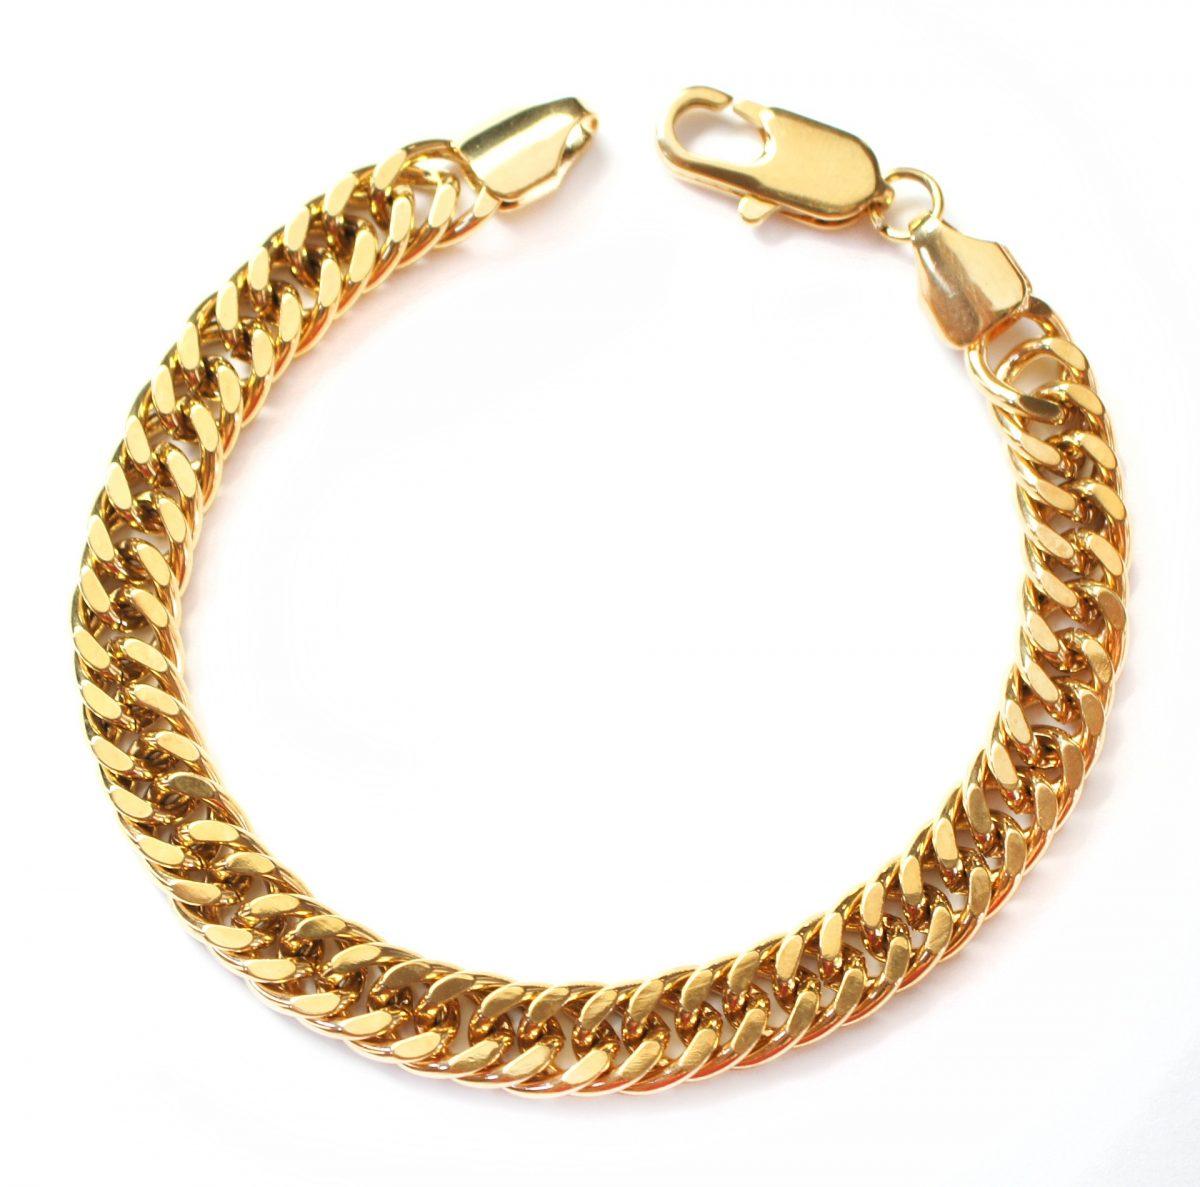 Tips On Choosing The Best Gold Bracelets